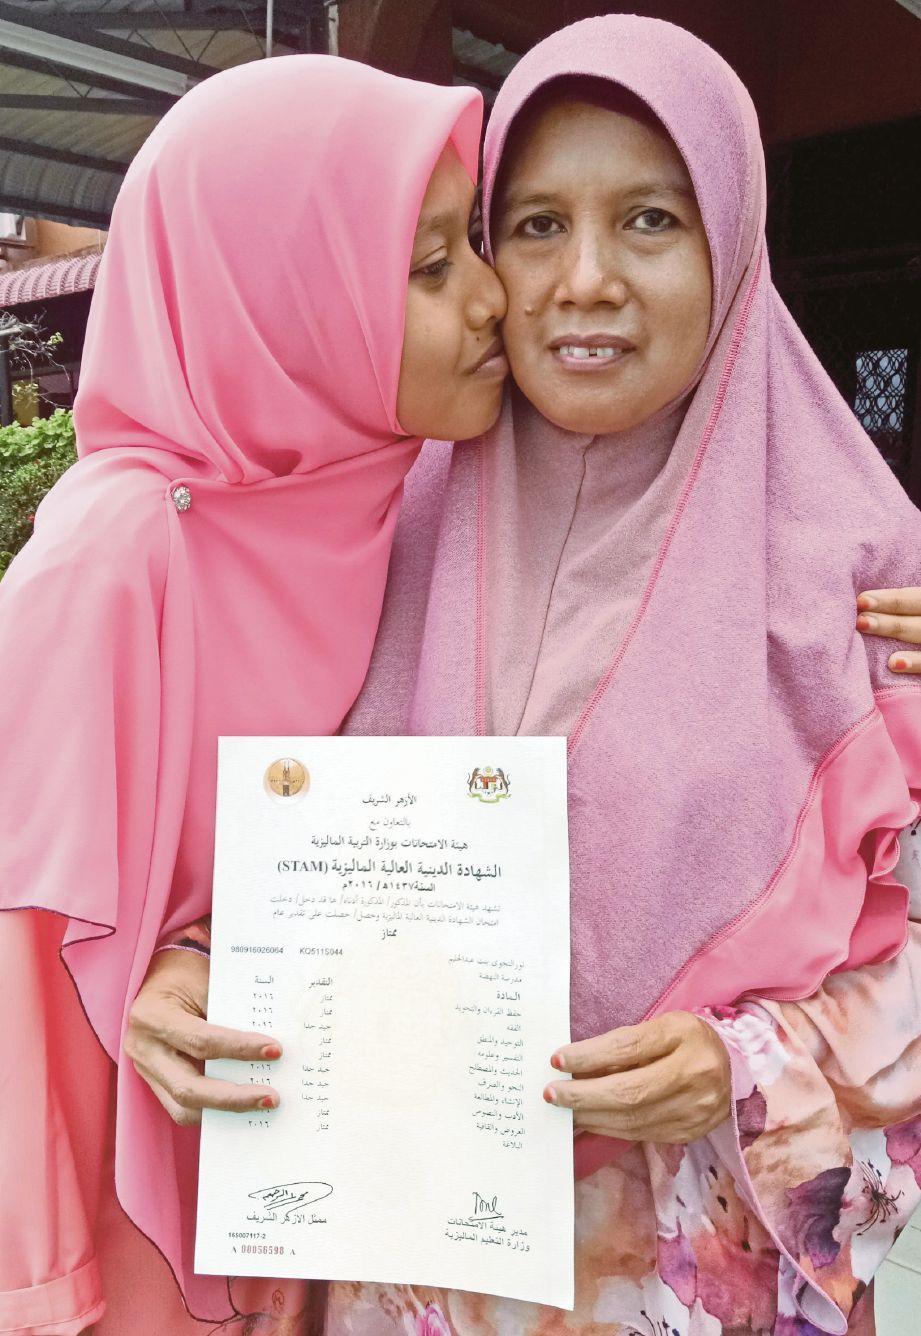 NURUL Najwa (kiri) mencium ibunya, Rohani  tanda terima kasih atas doa ibunya.